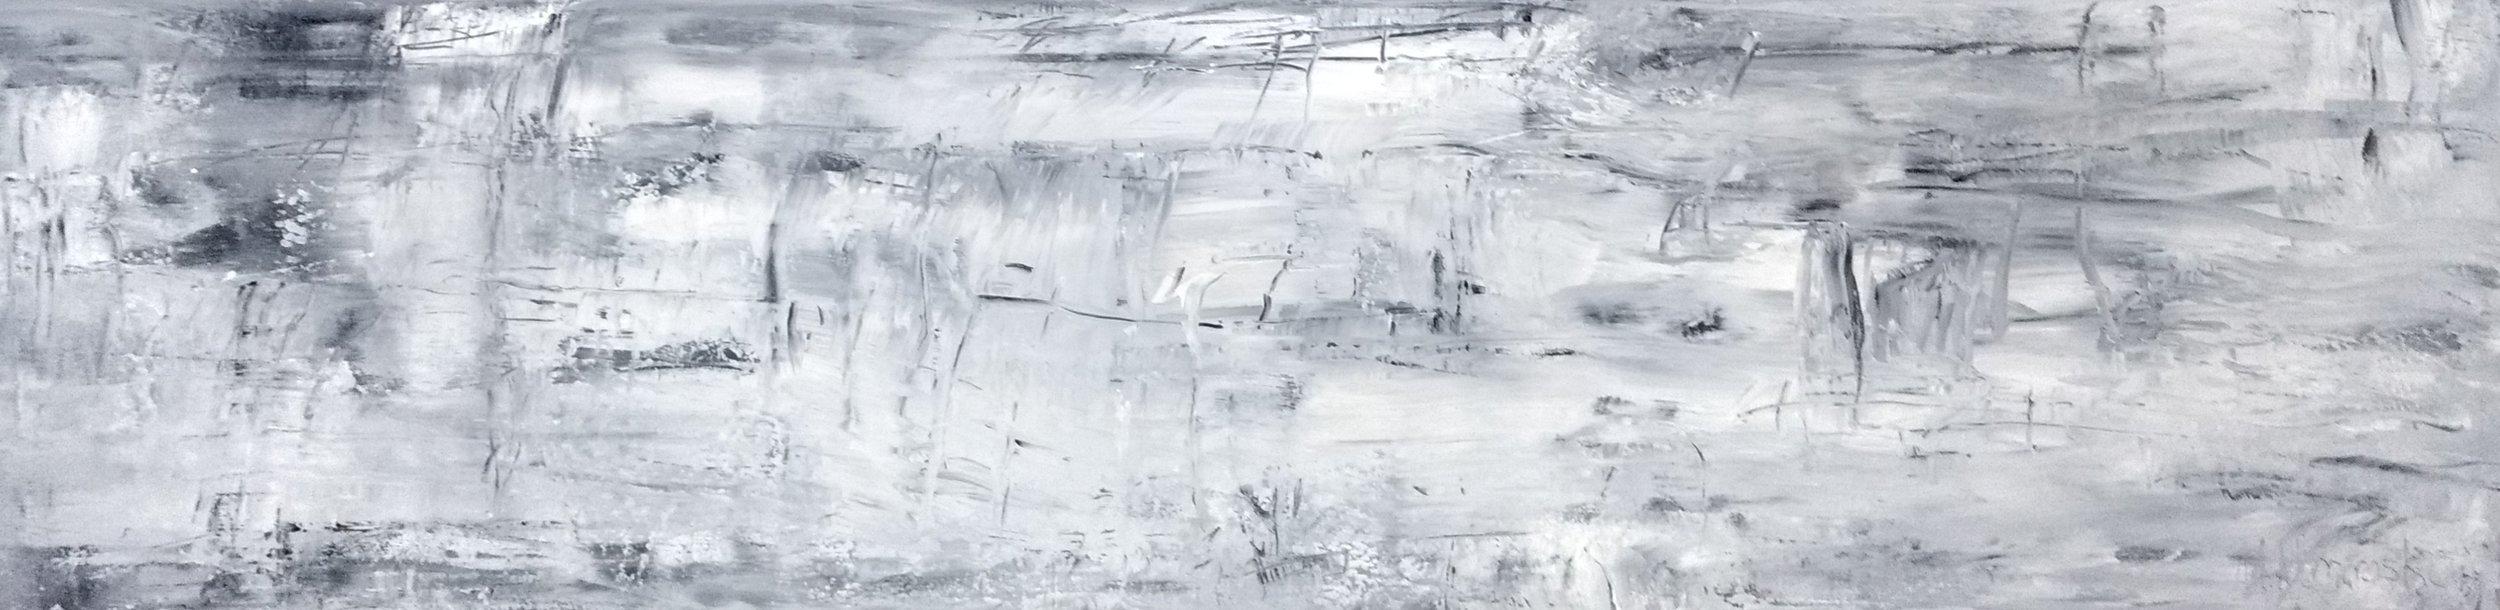 Copy of Margot Nimiroski